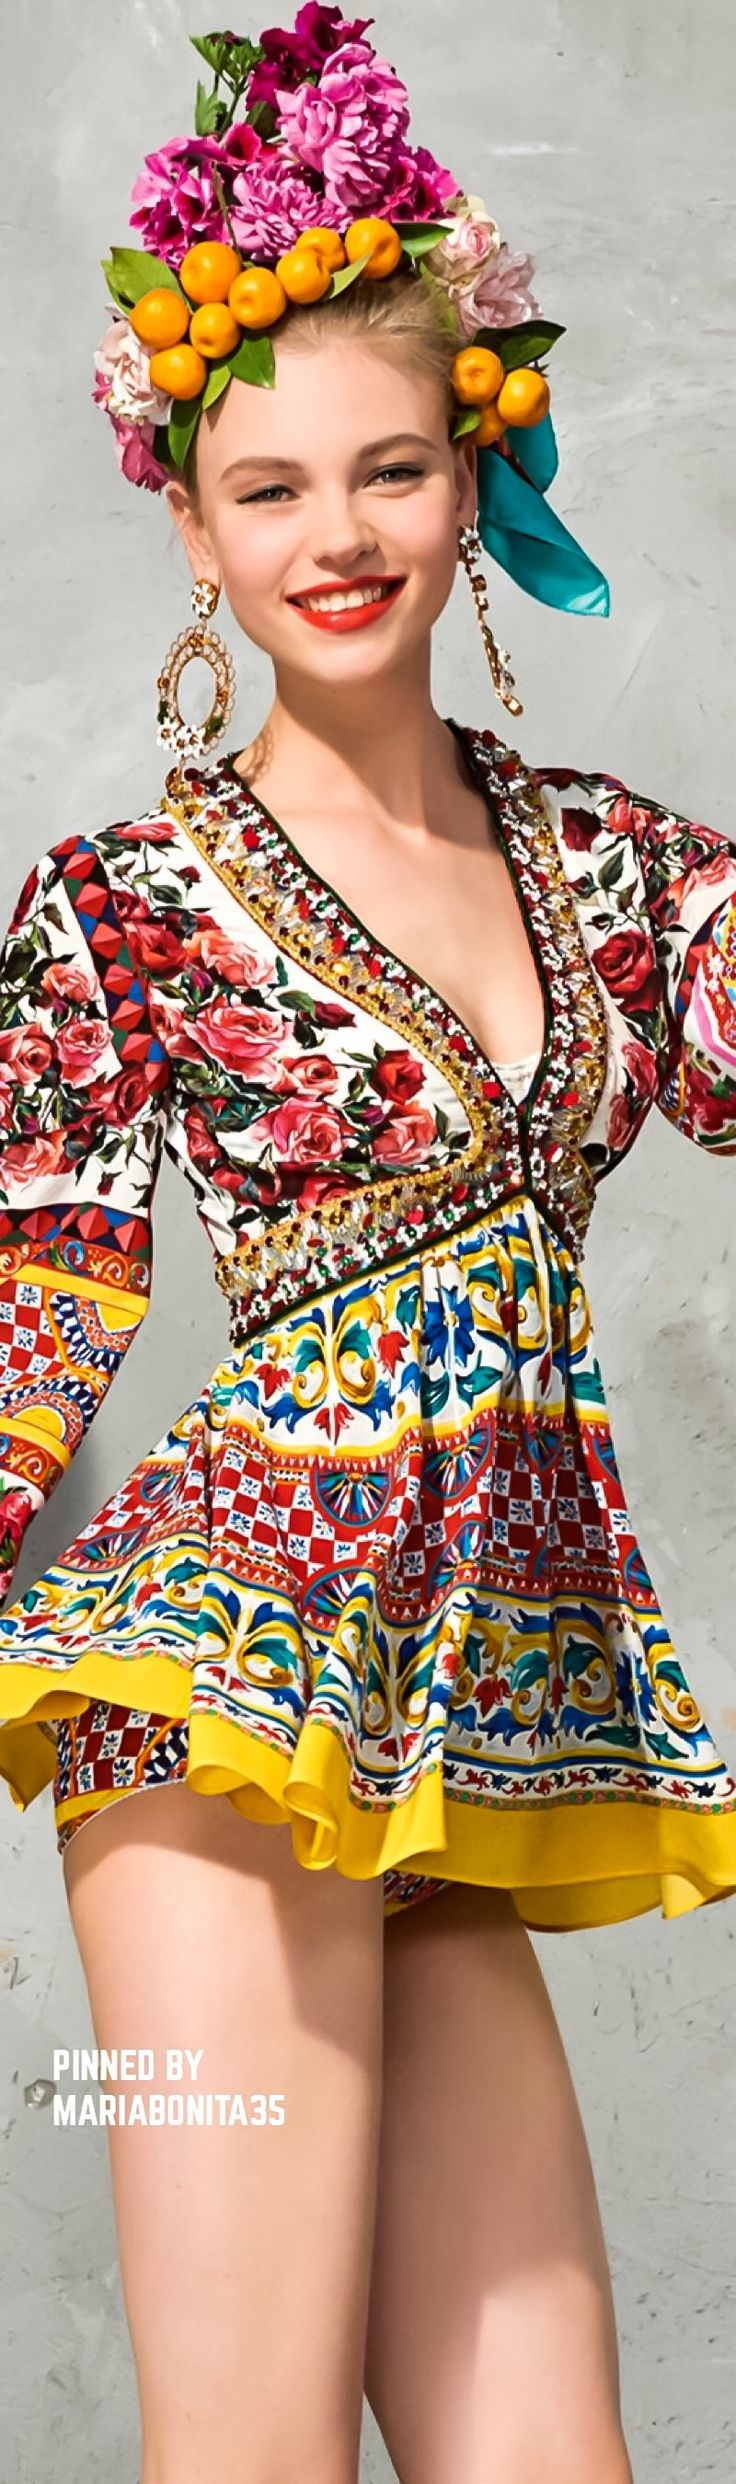 Dolce & Gabbana the Mambo Collection 2017